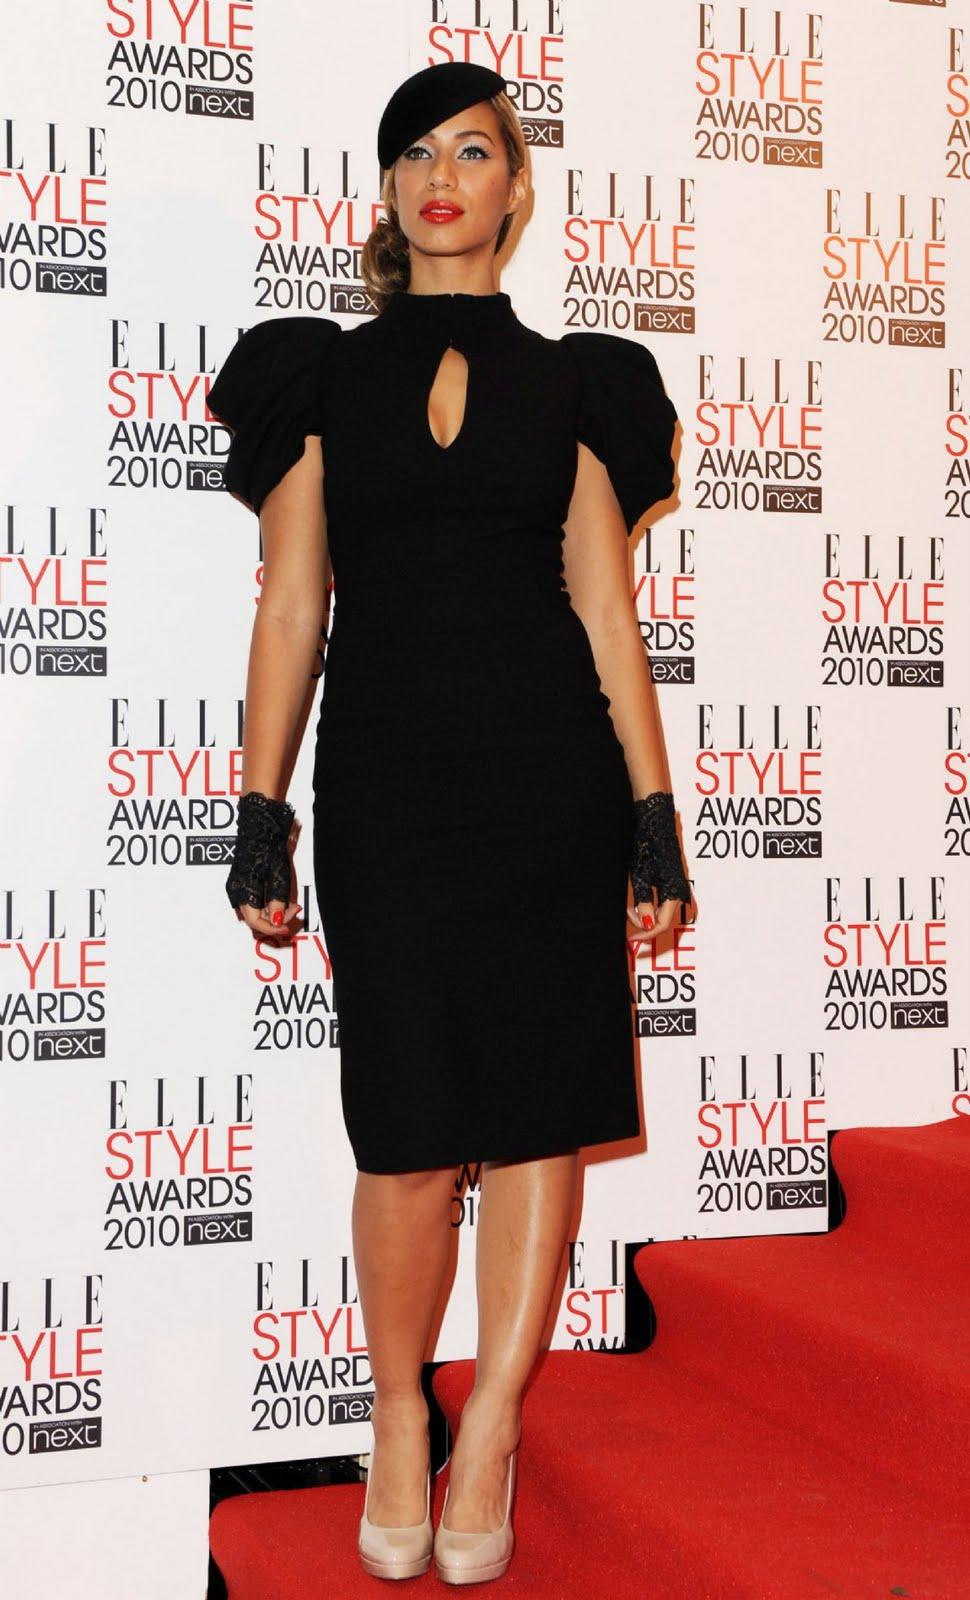 FemCeleb Portraits] Singer: Leona Lewis